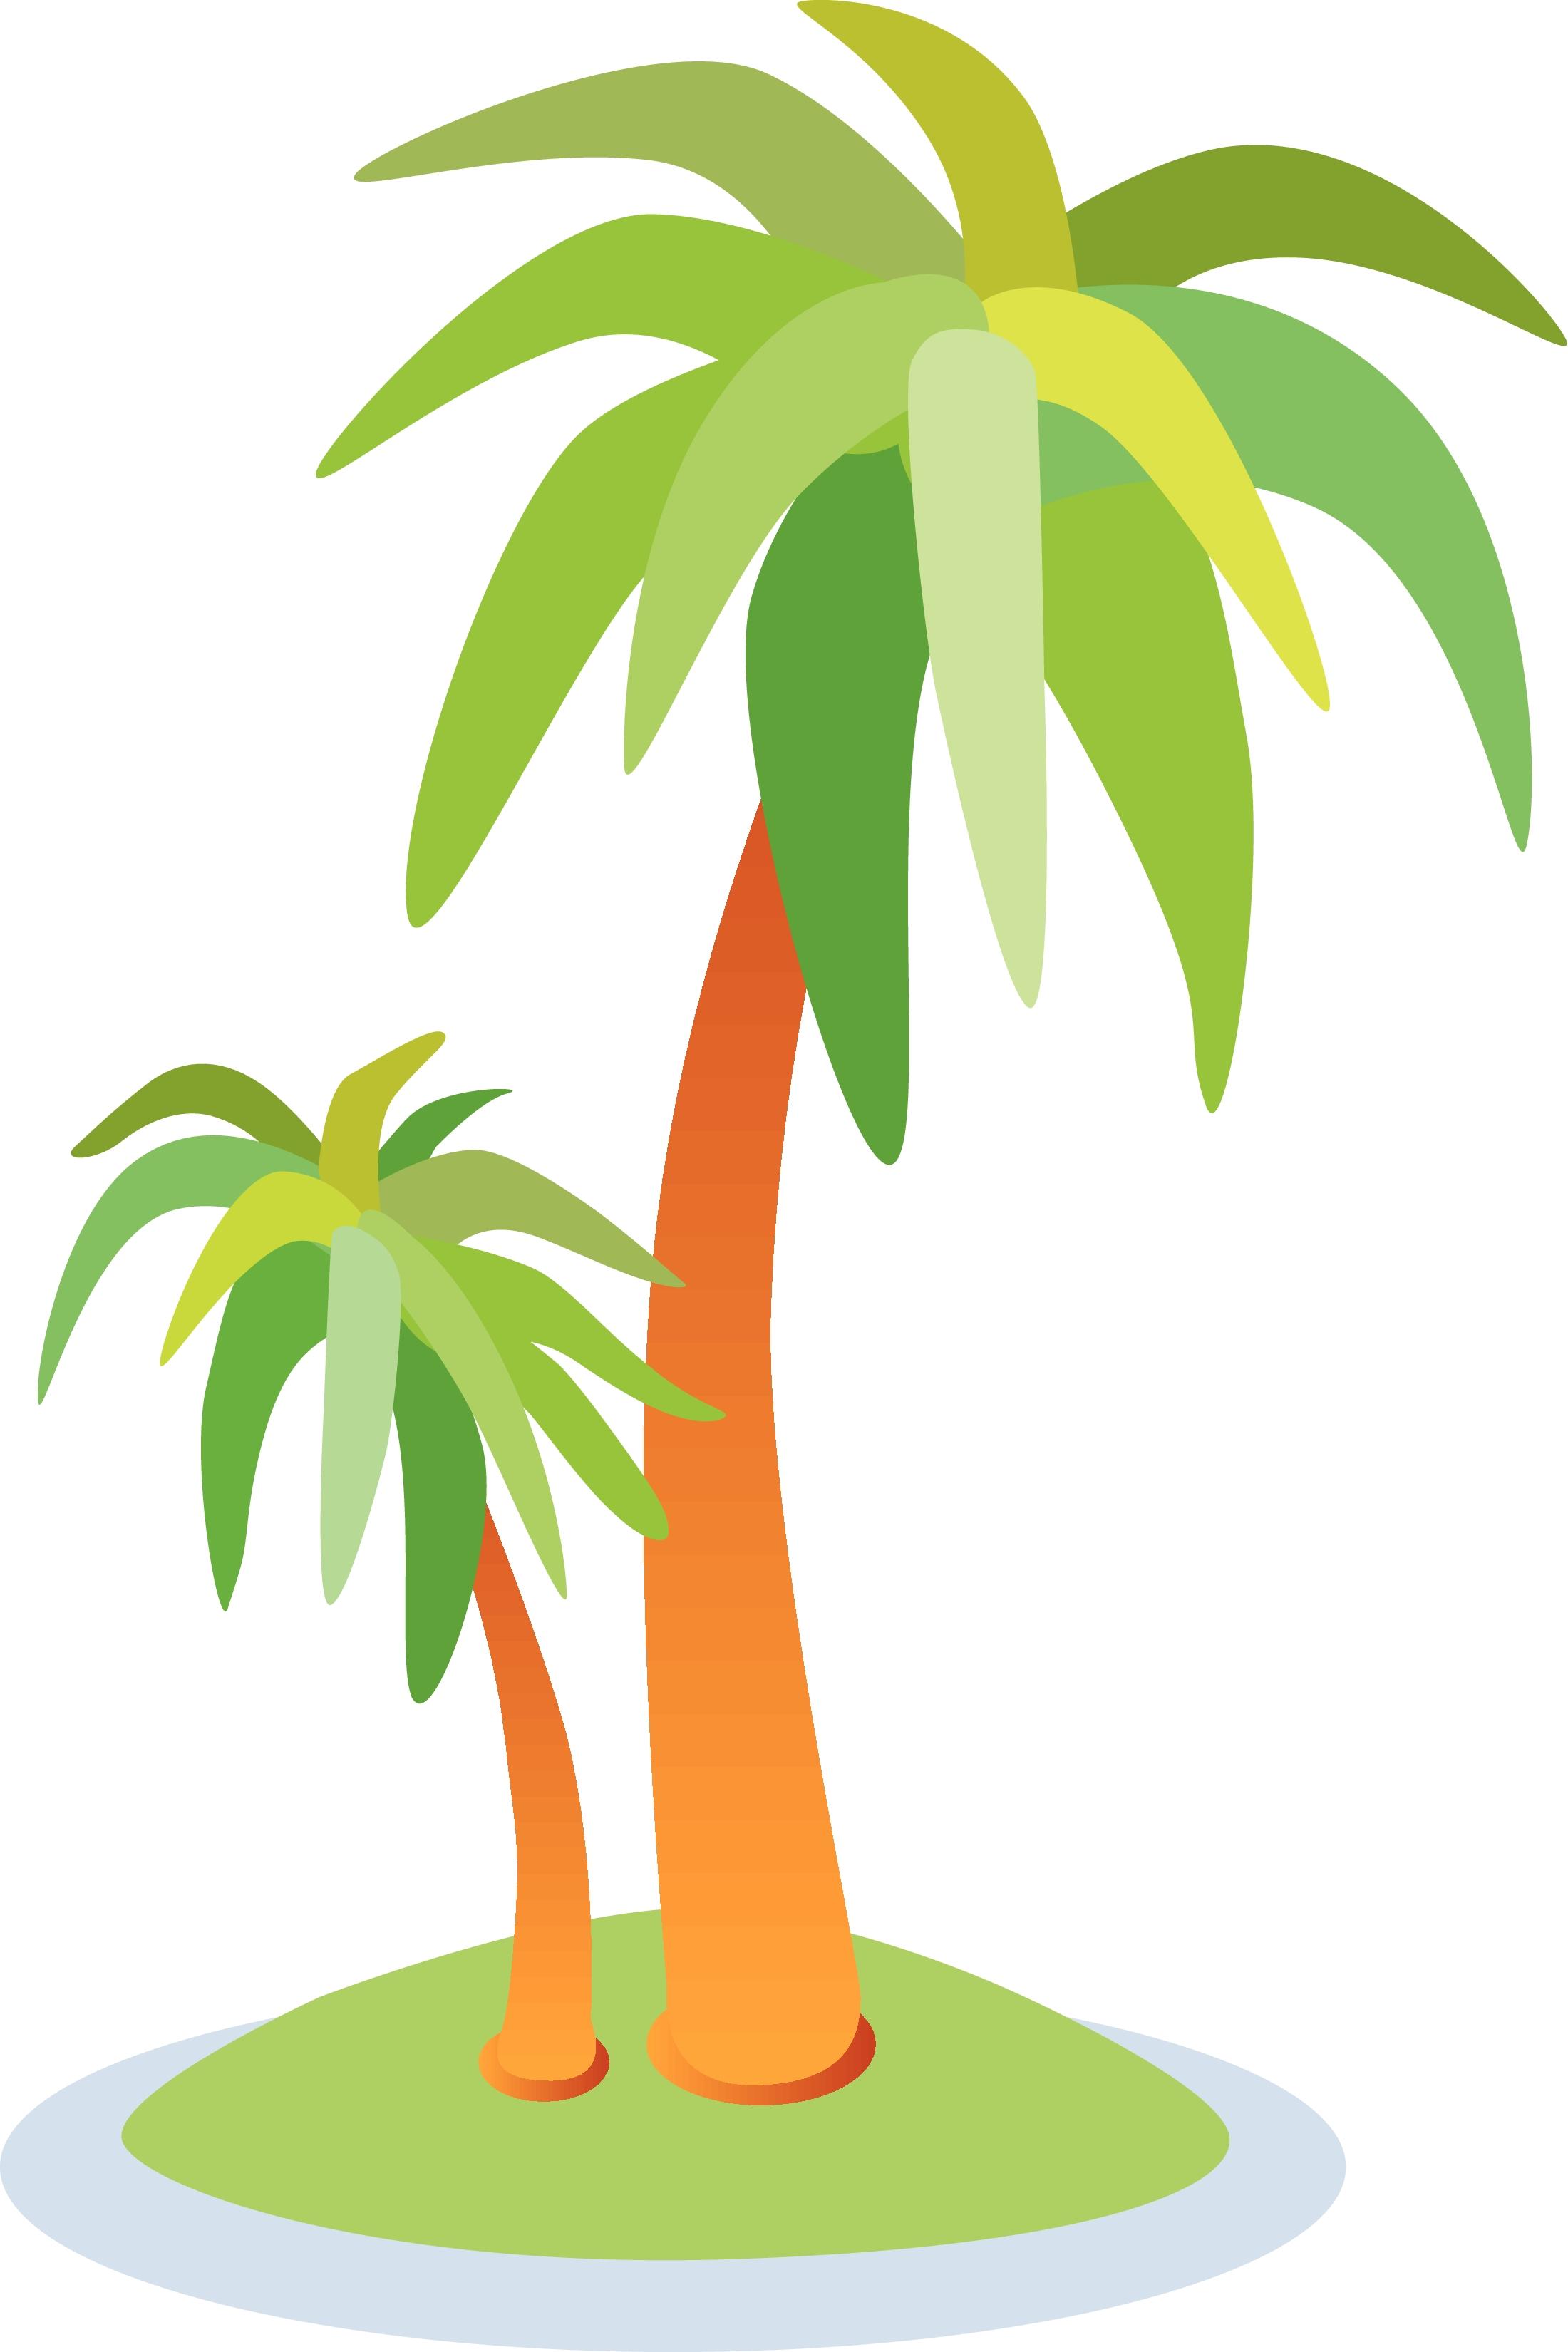 Trees Palm Clipart Clipart Kid-Trees palm clipart clipart kid-13